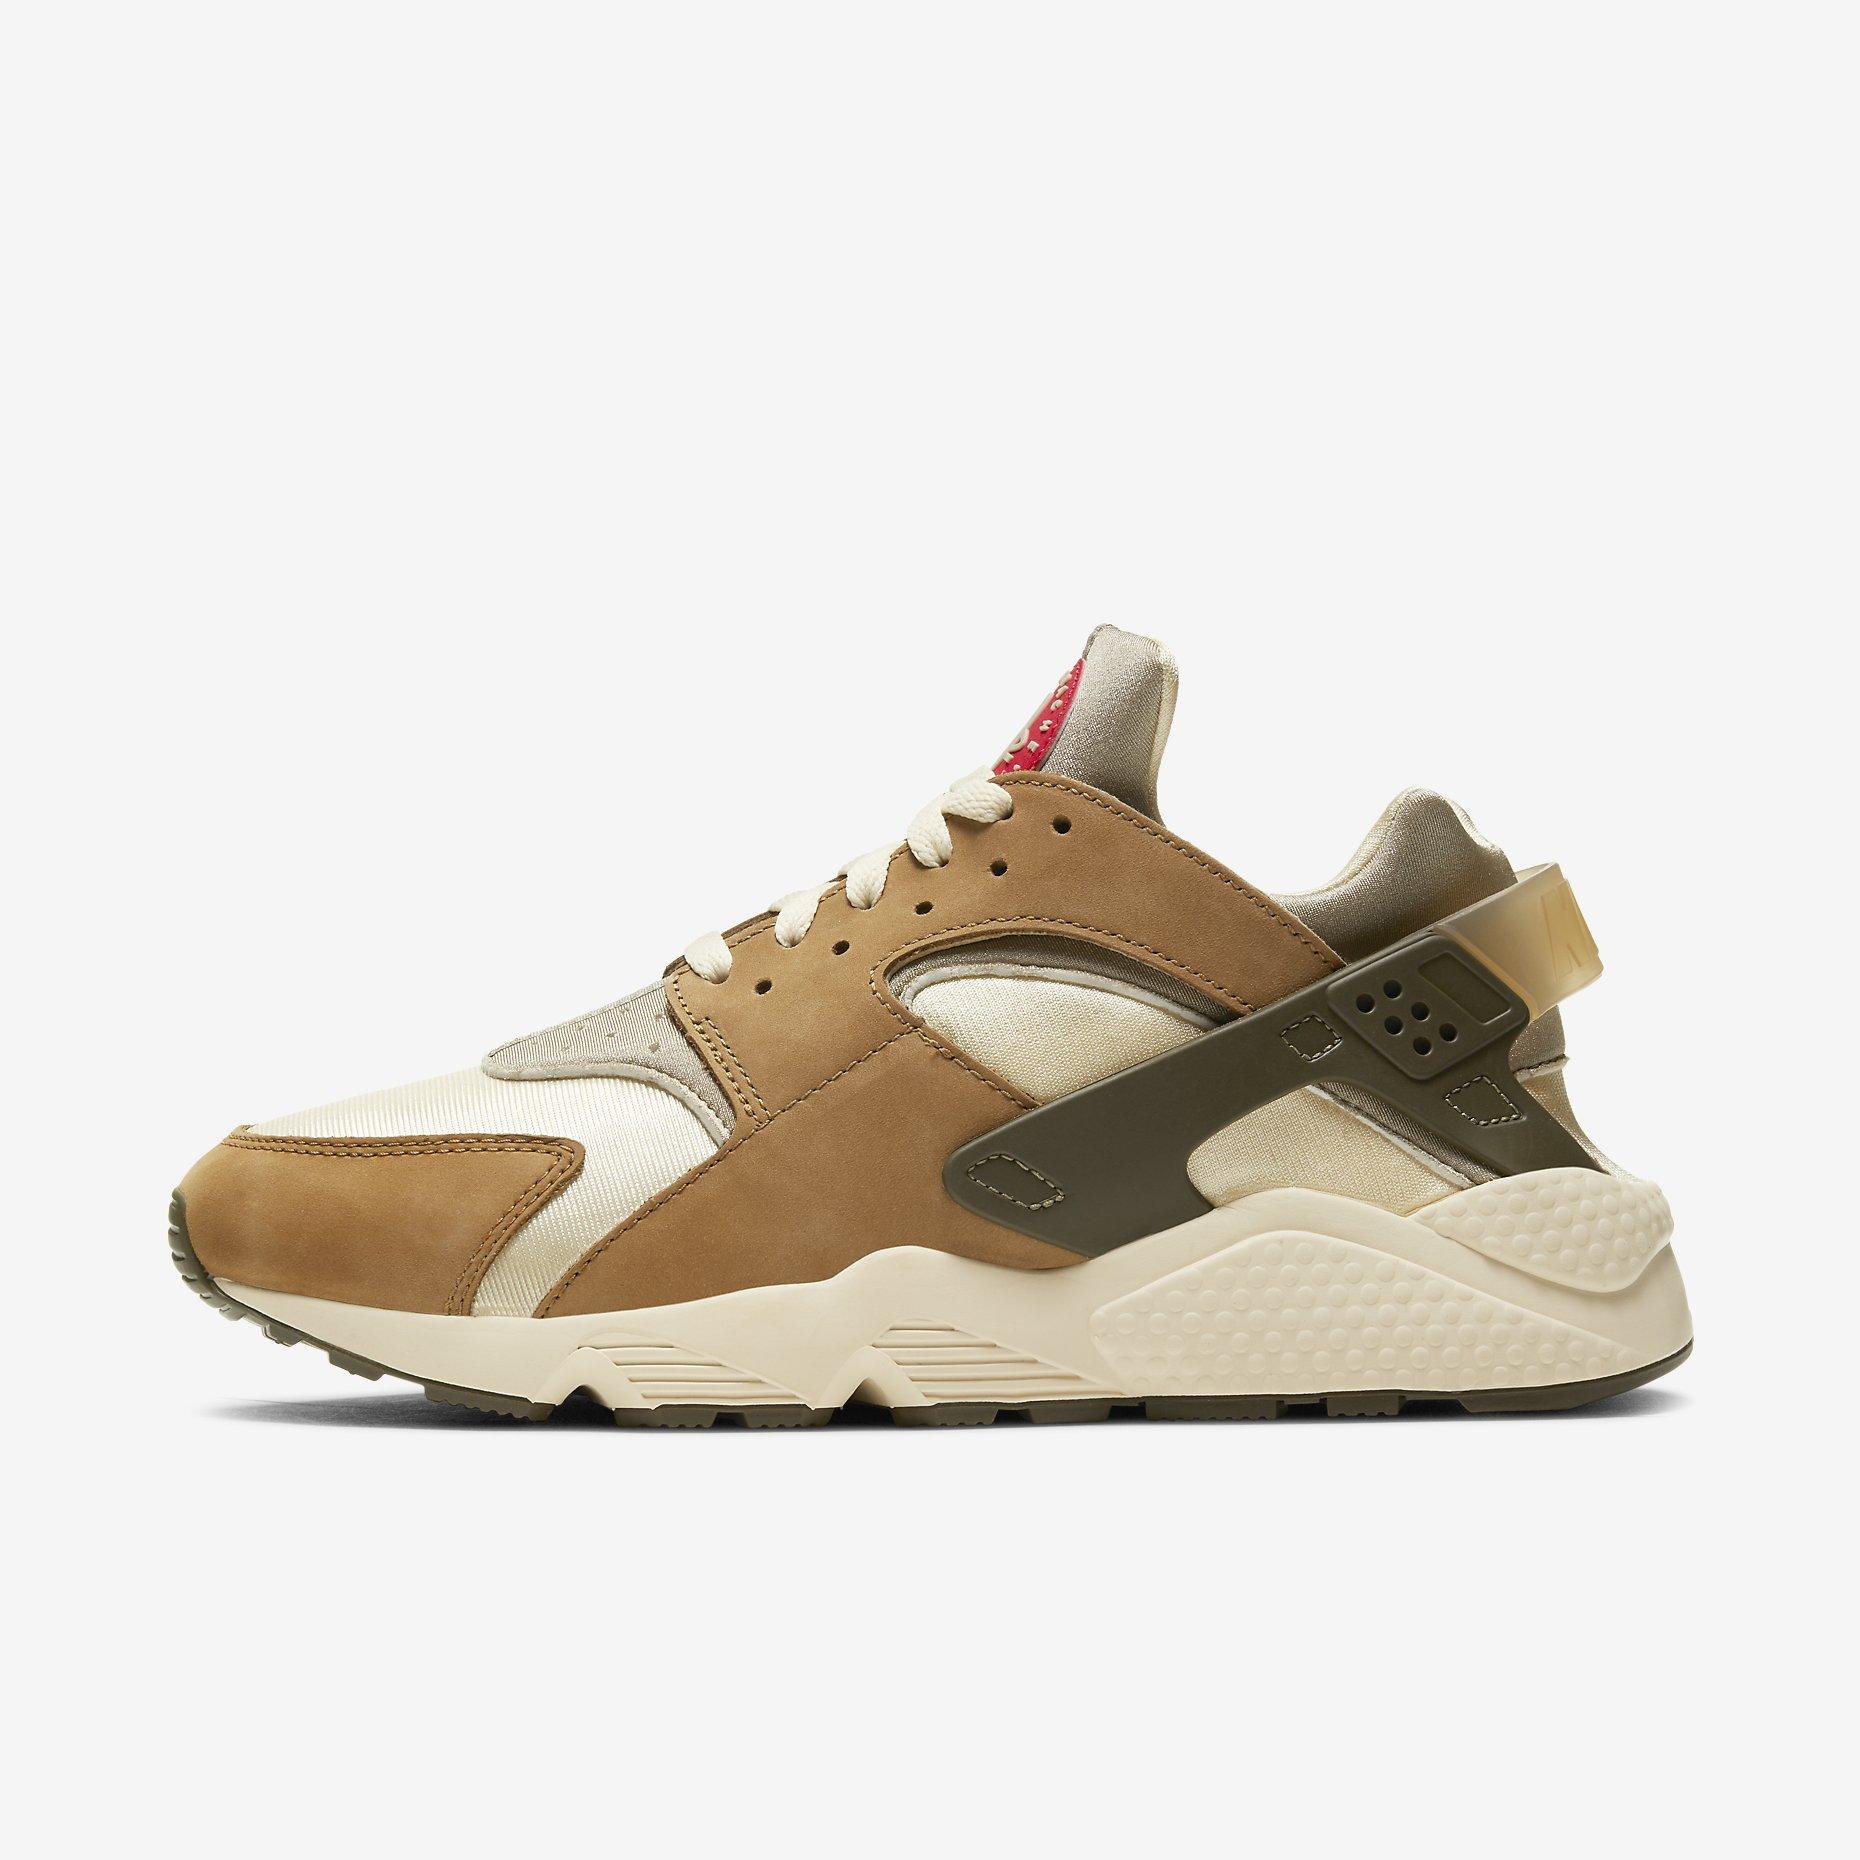 Stüssy x Nike Air Huarache LE 'Desert Oak'}